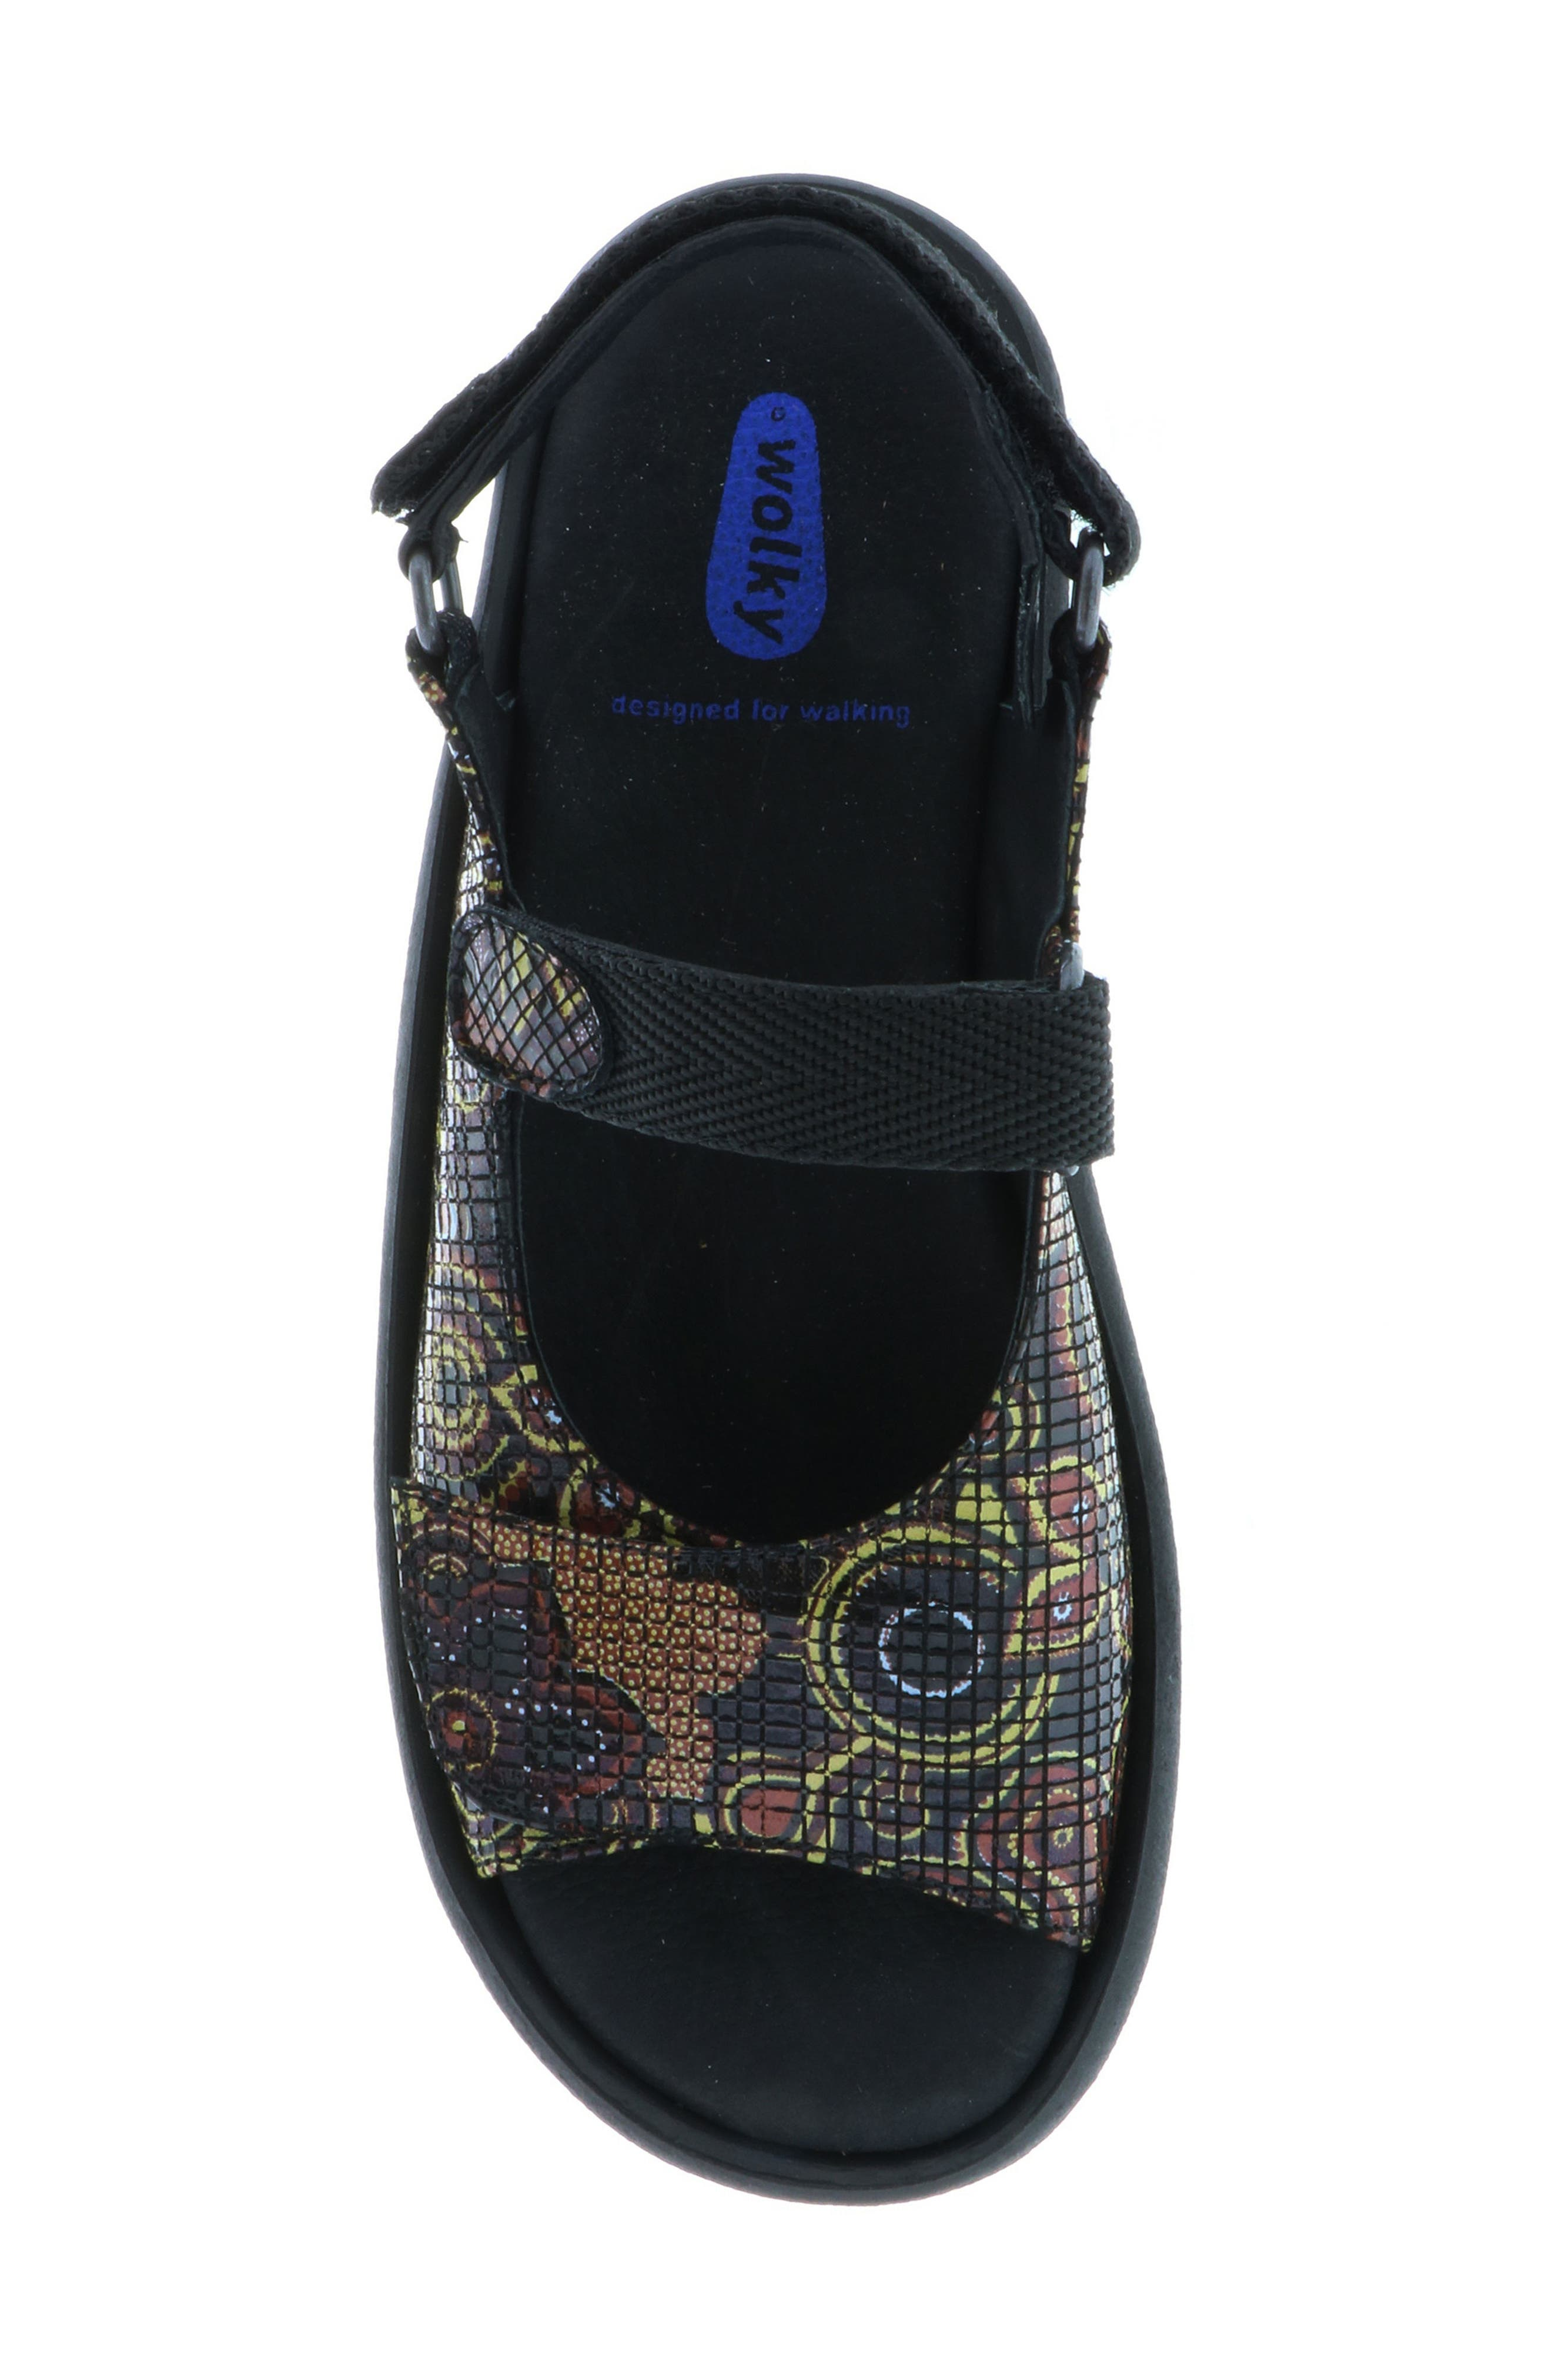 Jewel Sport Sandal,                             Alternate thumbnail 4, color,                             Black Flower Print